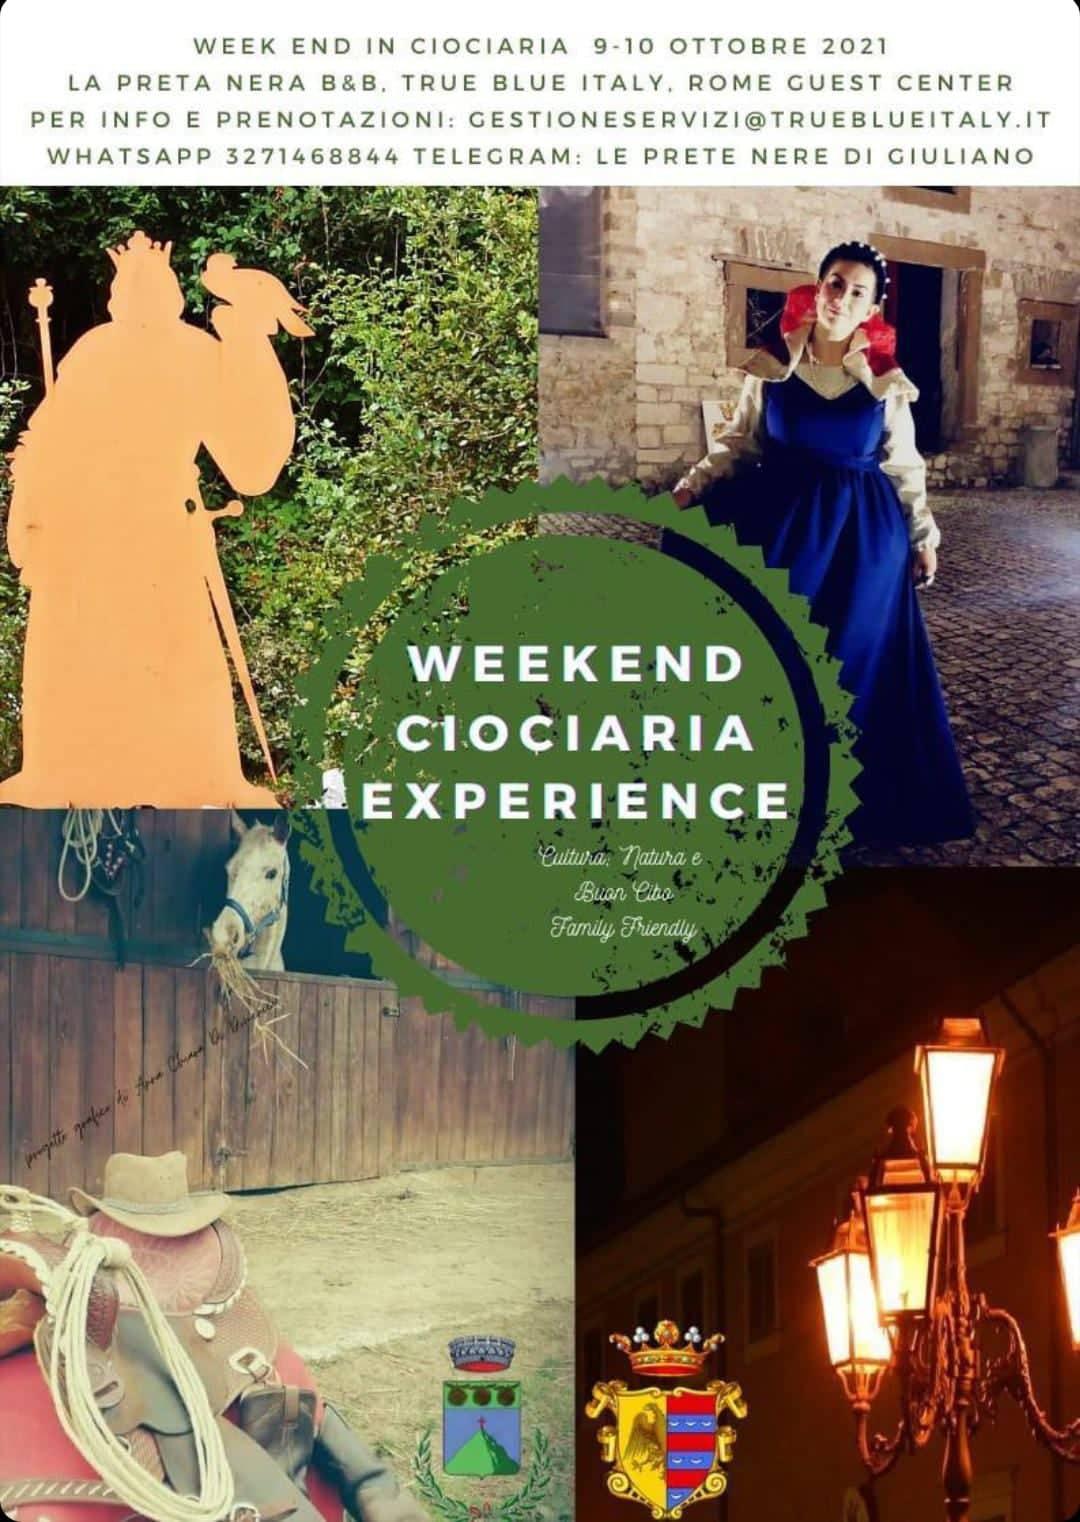 Weekend Ciociaria Experience @ Patrica